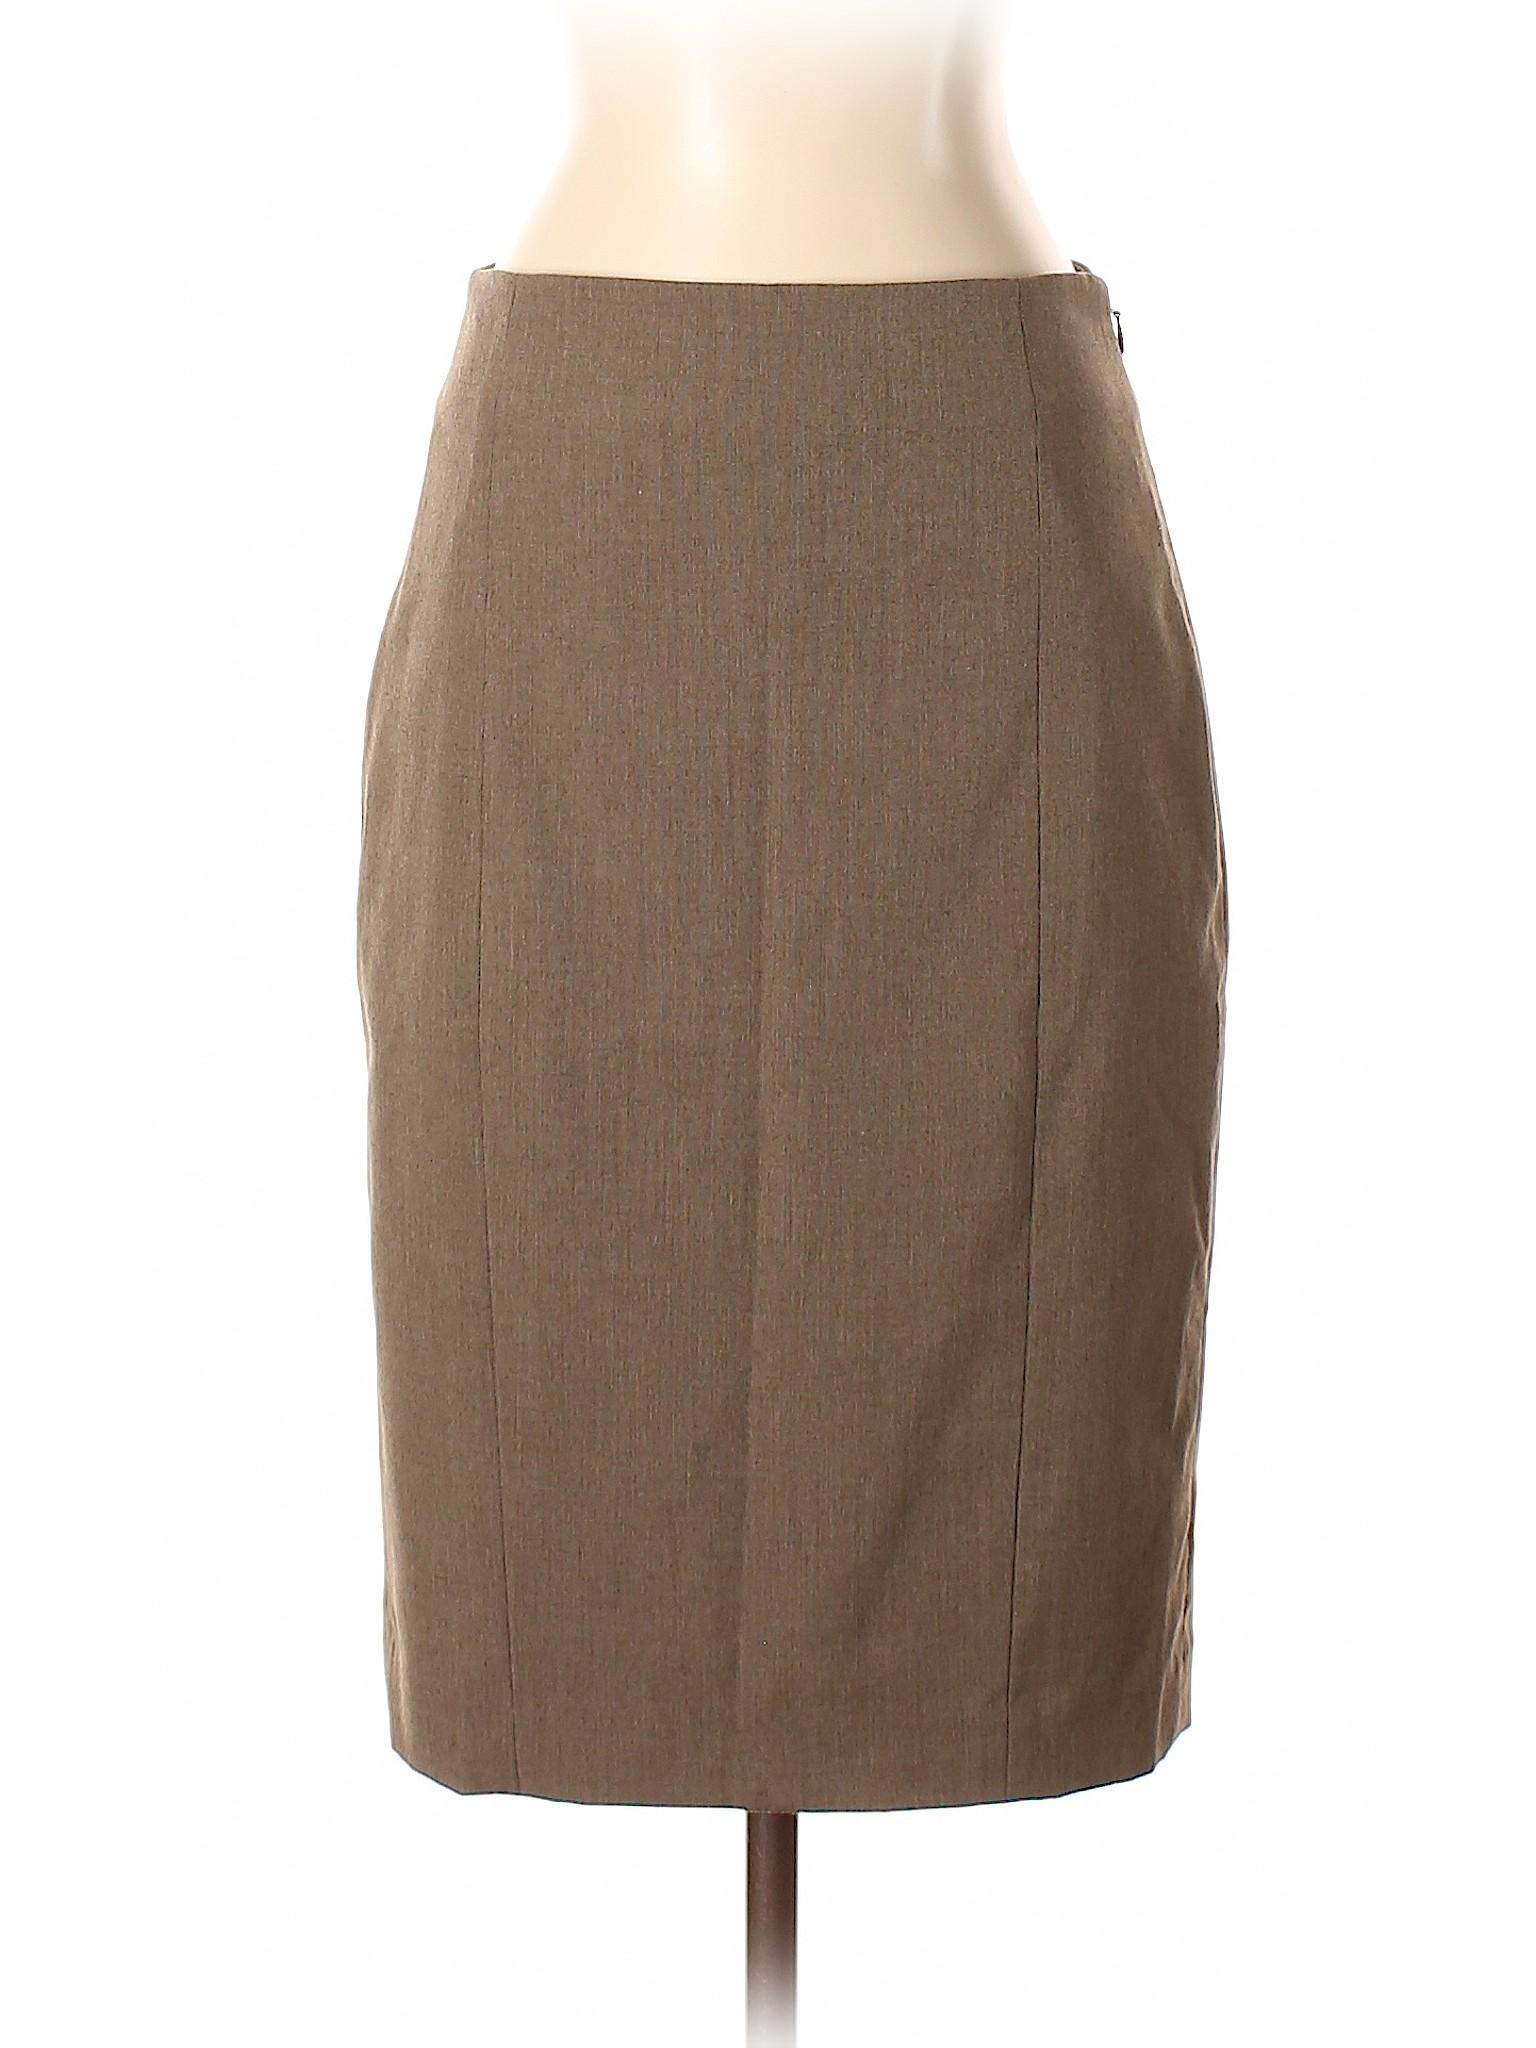 Skirt Casual Boutique Boutique Casual Skirt Casual Skirt Boutique Boutique Boutique Casual Casual Skirt d45pqSWBdw